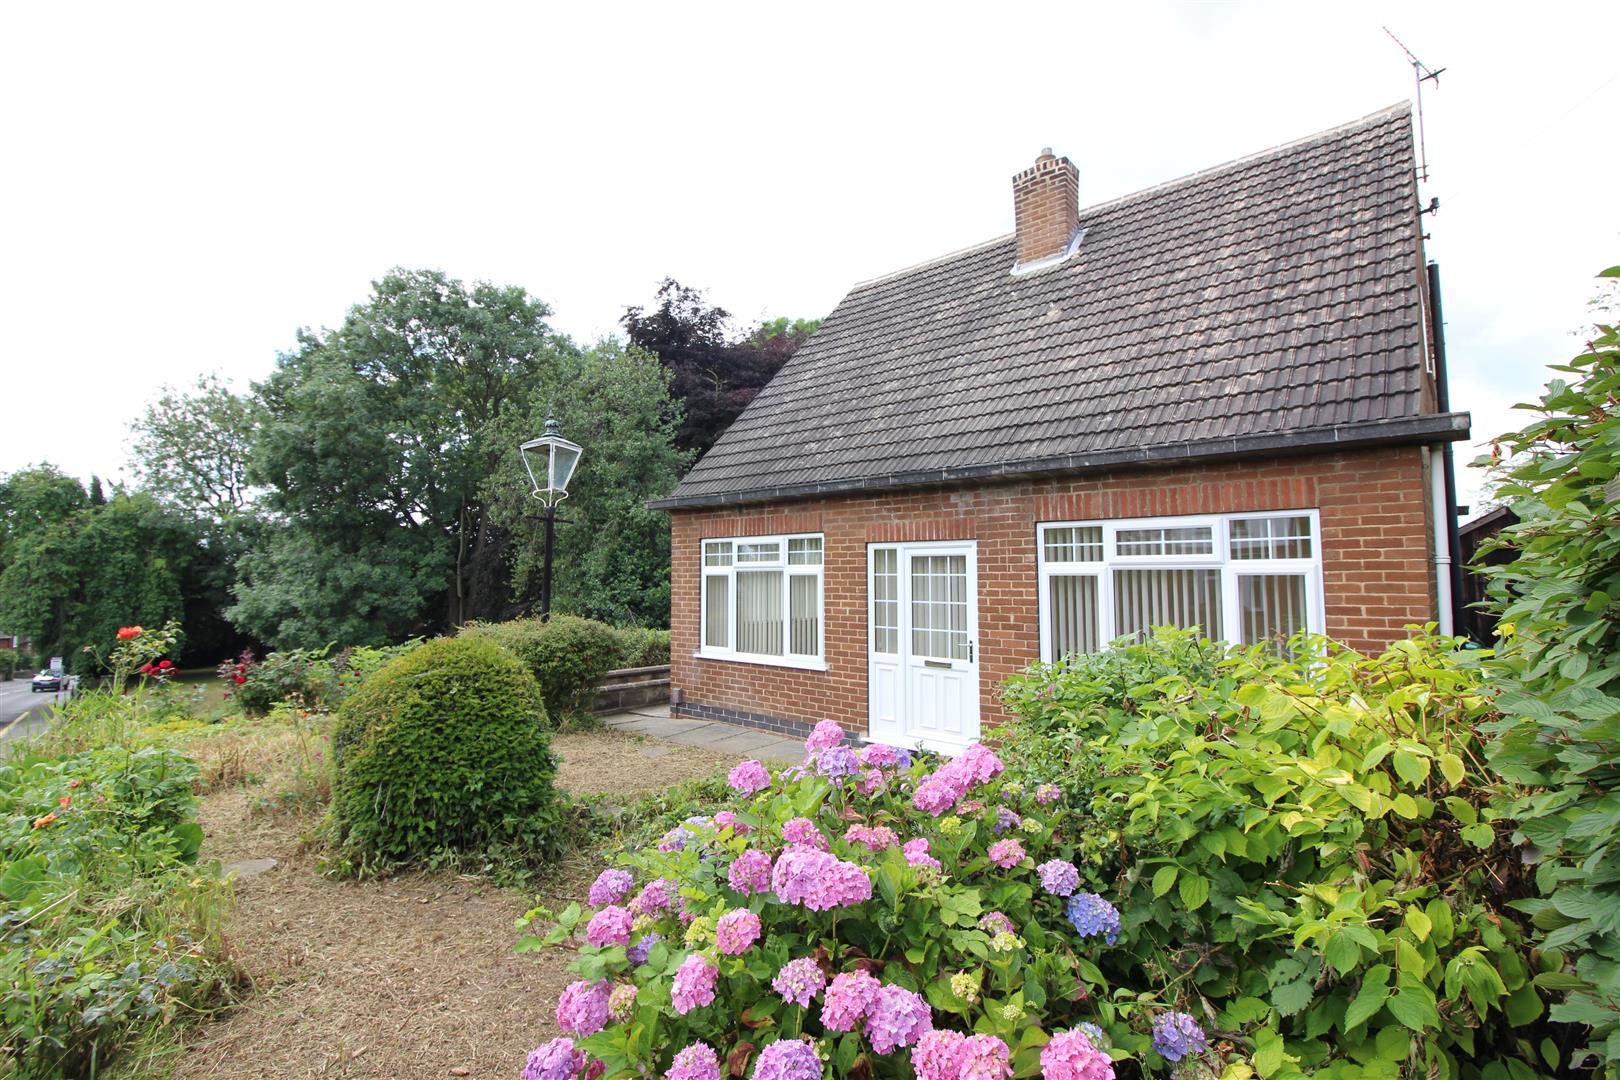 3 Bedrooms House for sale in Stanton Road, Ilkeston